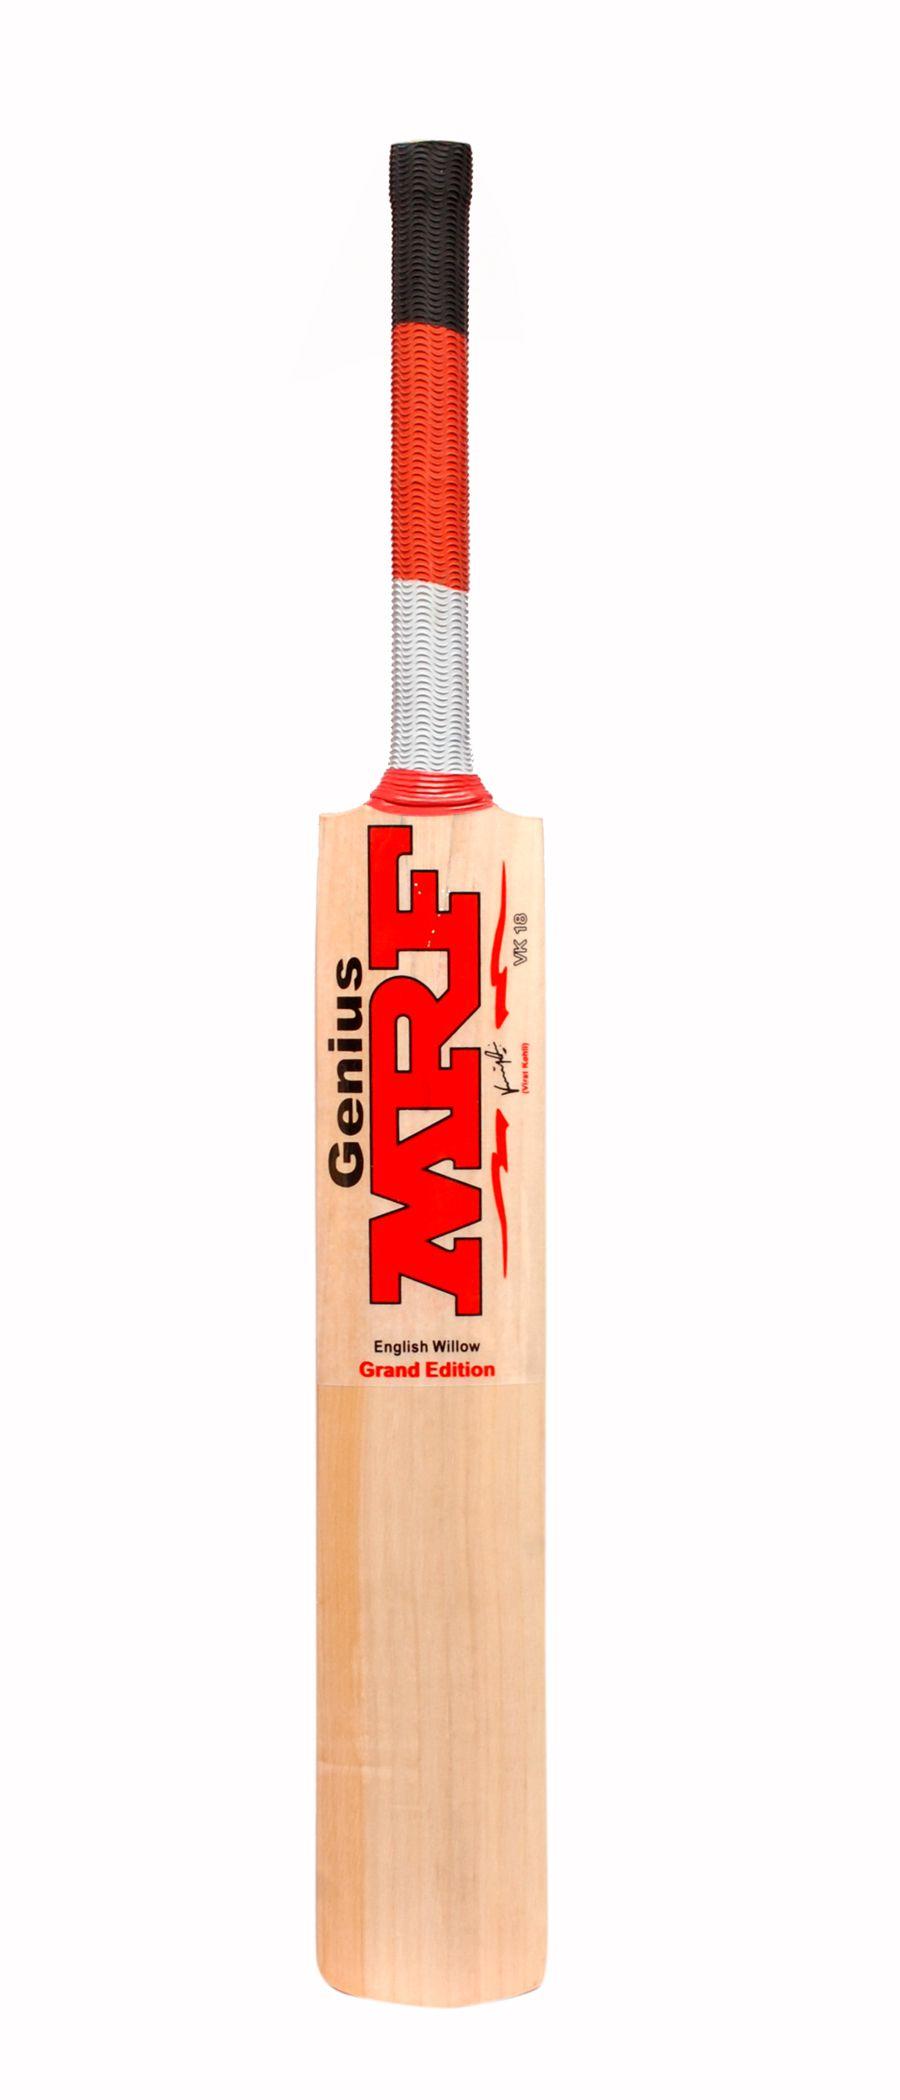 Mrf Grand Edition (Virat Kohli Endorsed) English Willow Cricket Bat